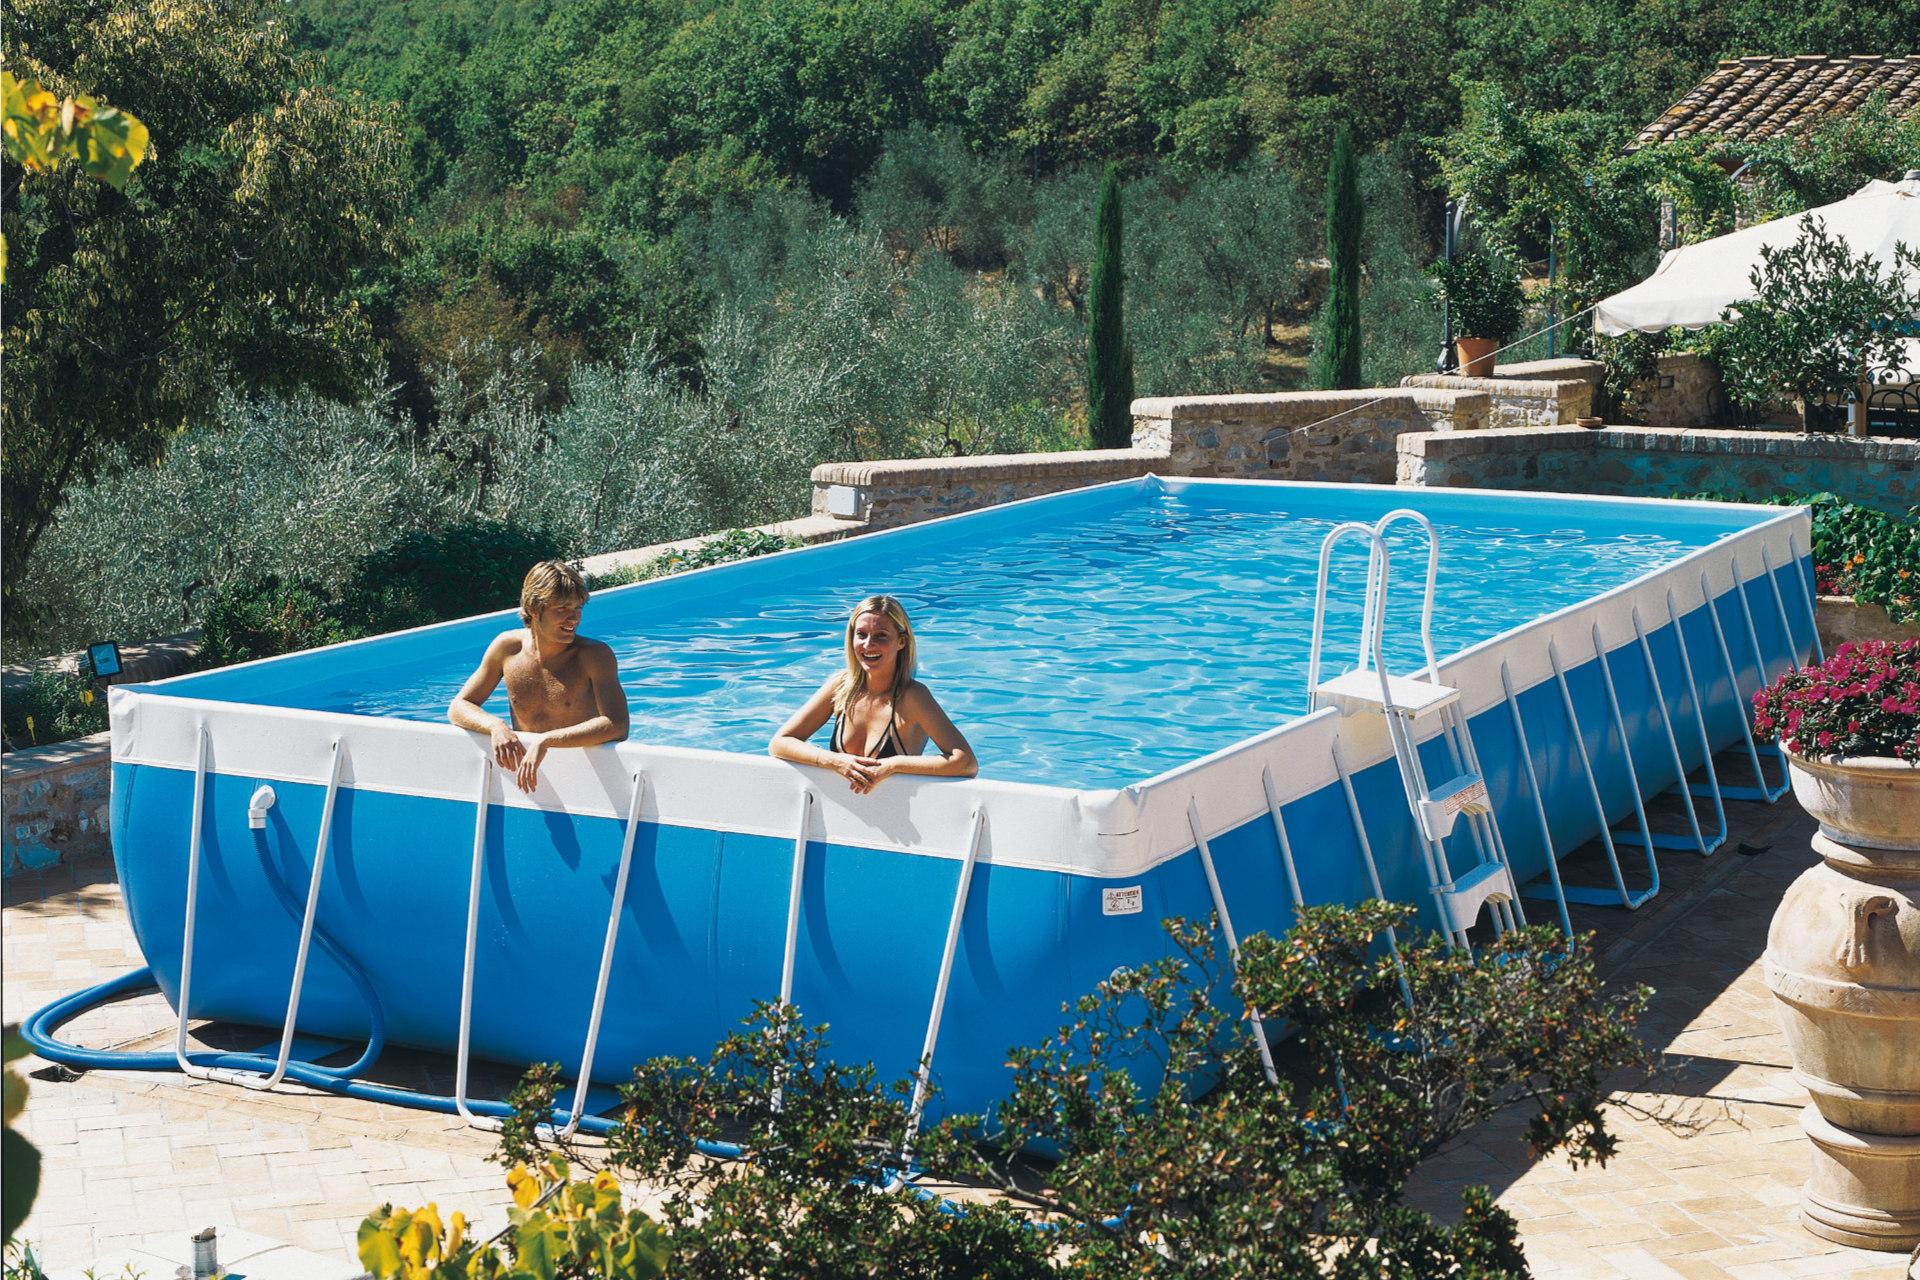 Le Guide Complet Des Piscines Hors-Sol - Aquapolis concernant Piscine Hors Sol Haut De Gamme